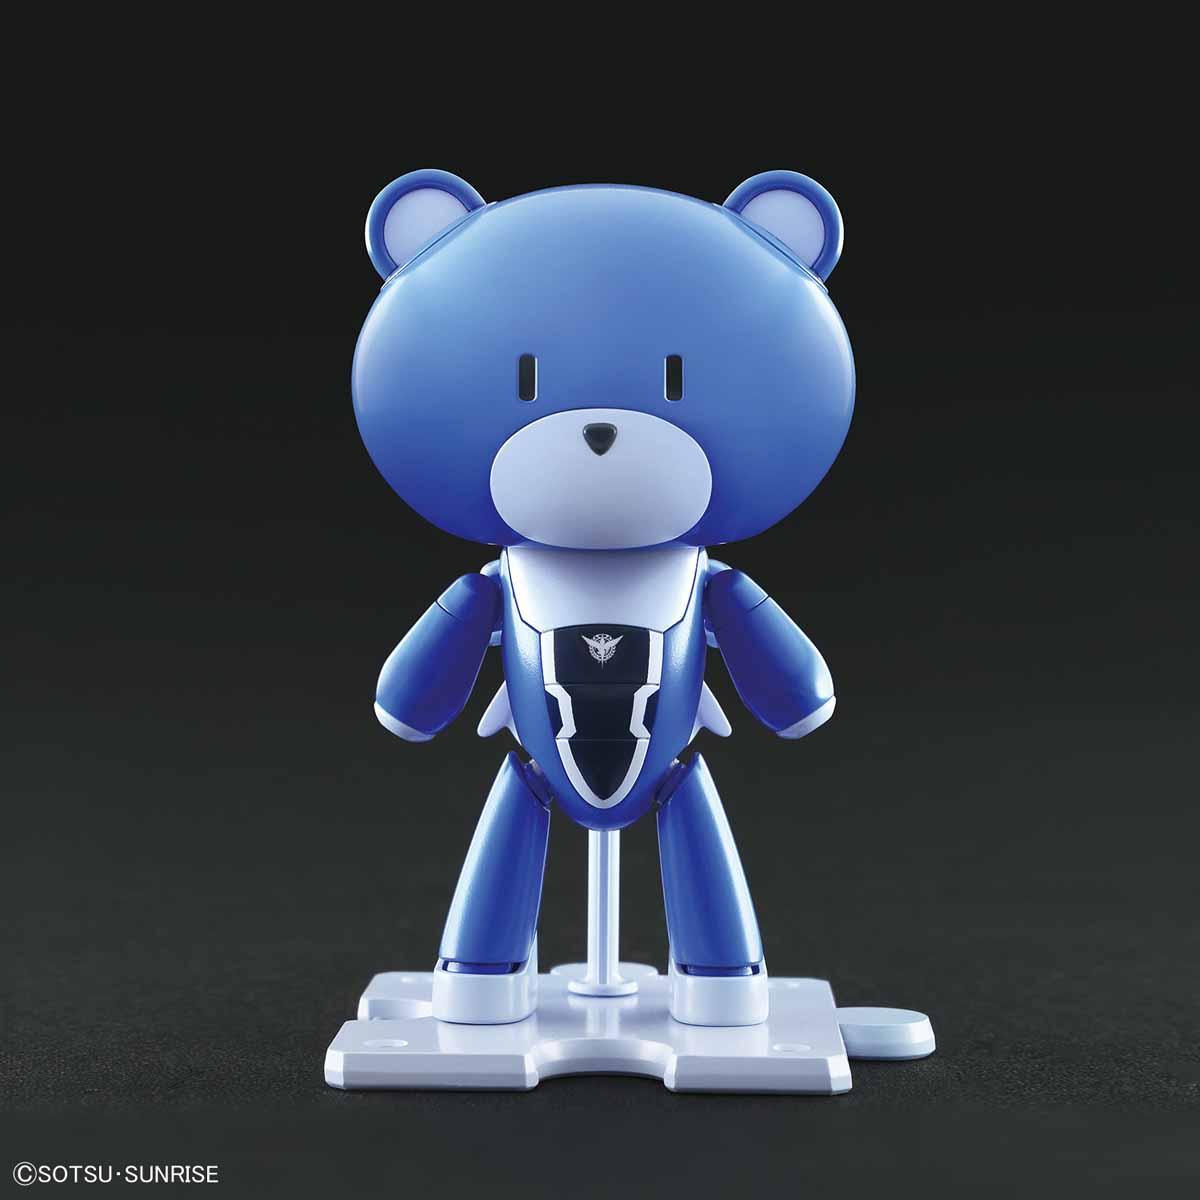 55912HGPG 1/144 プチッガイ 刹那・F・セイエイブルー&プラカード [Petit'gguy Setsuna F. Seiei Blue & Placard]